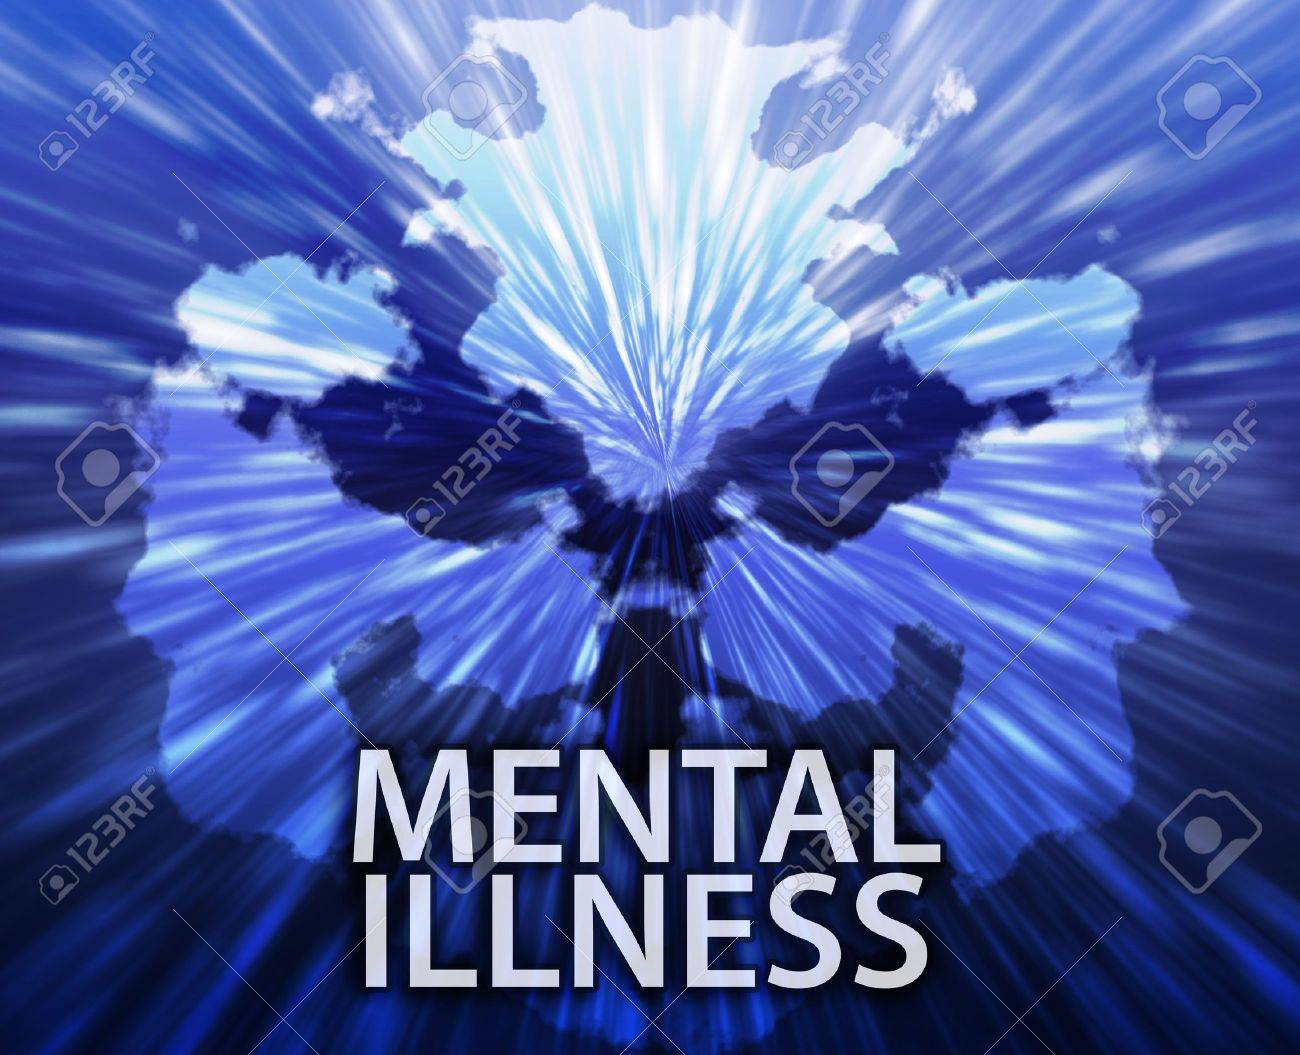 Psychiatric treatment mental illness rorschach inkblot concept background Stock Photo - 6165333